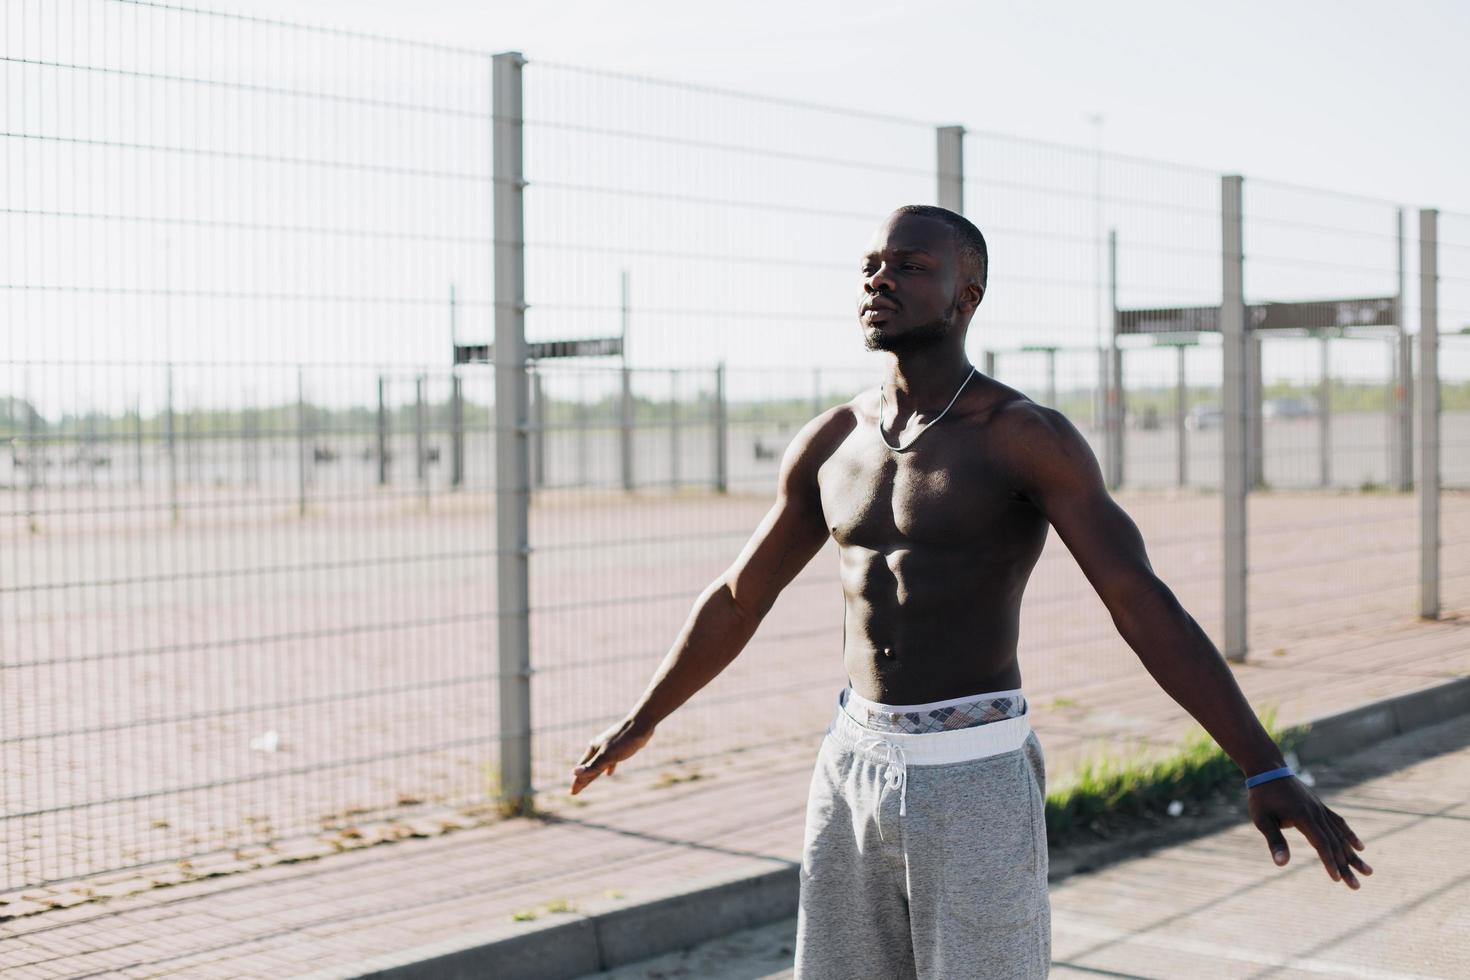 Afro-Amerikaanse man doet ademhalingsoefeningen foto